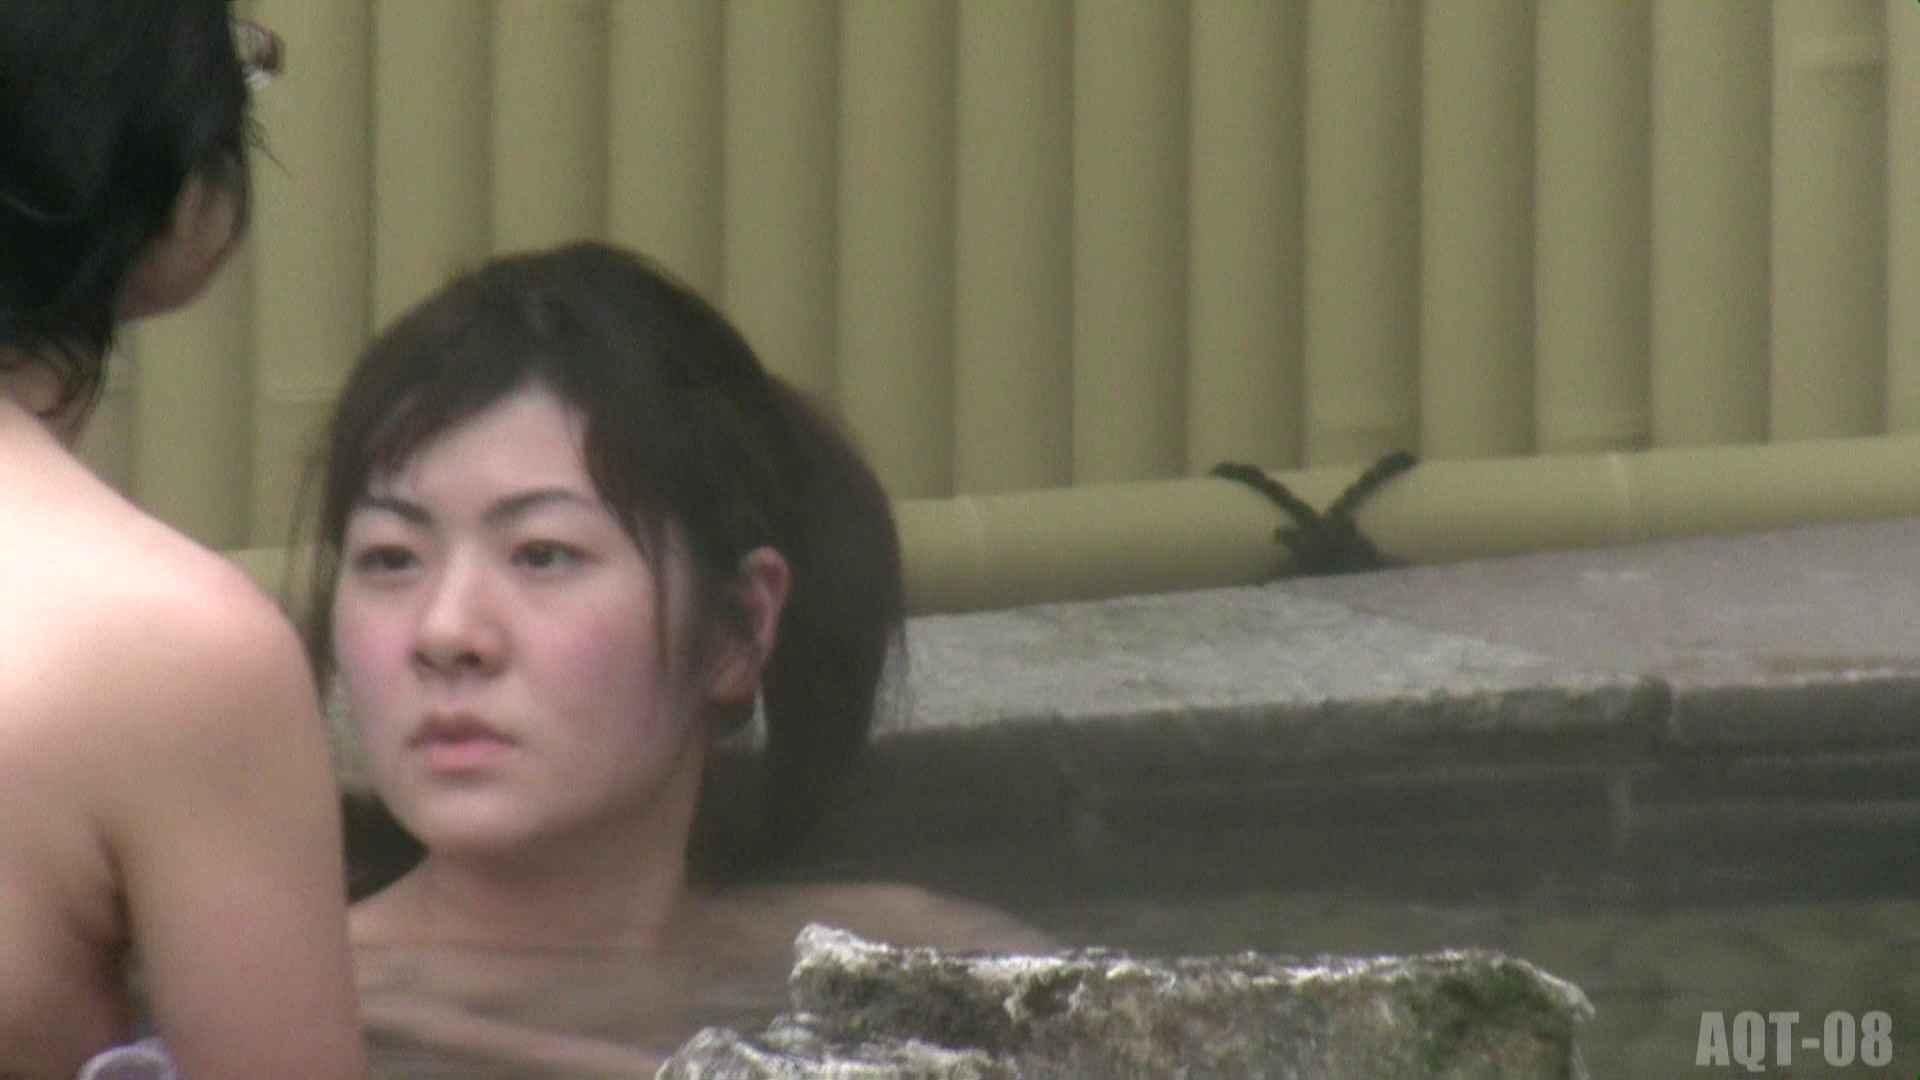 Aquaな露天風呂Vol.774 HなOL AV無料動画キャプチャ 83pic 30